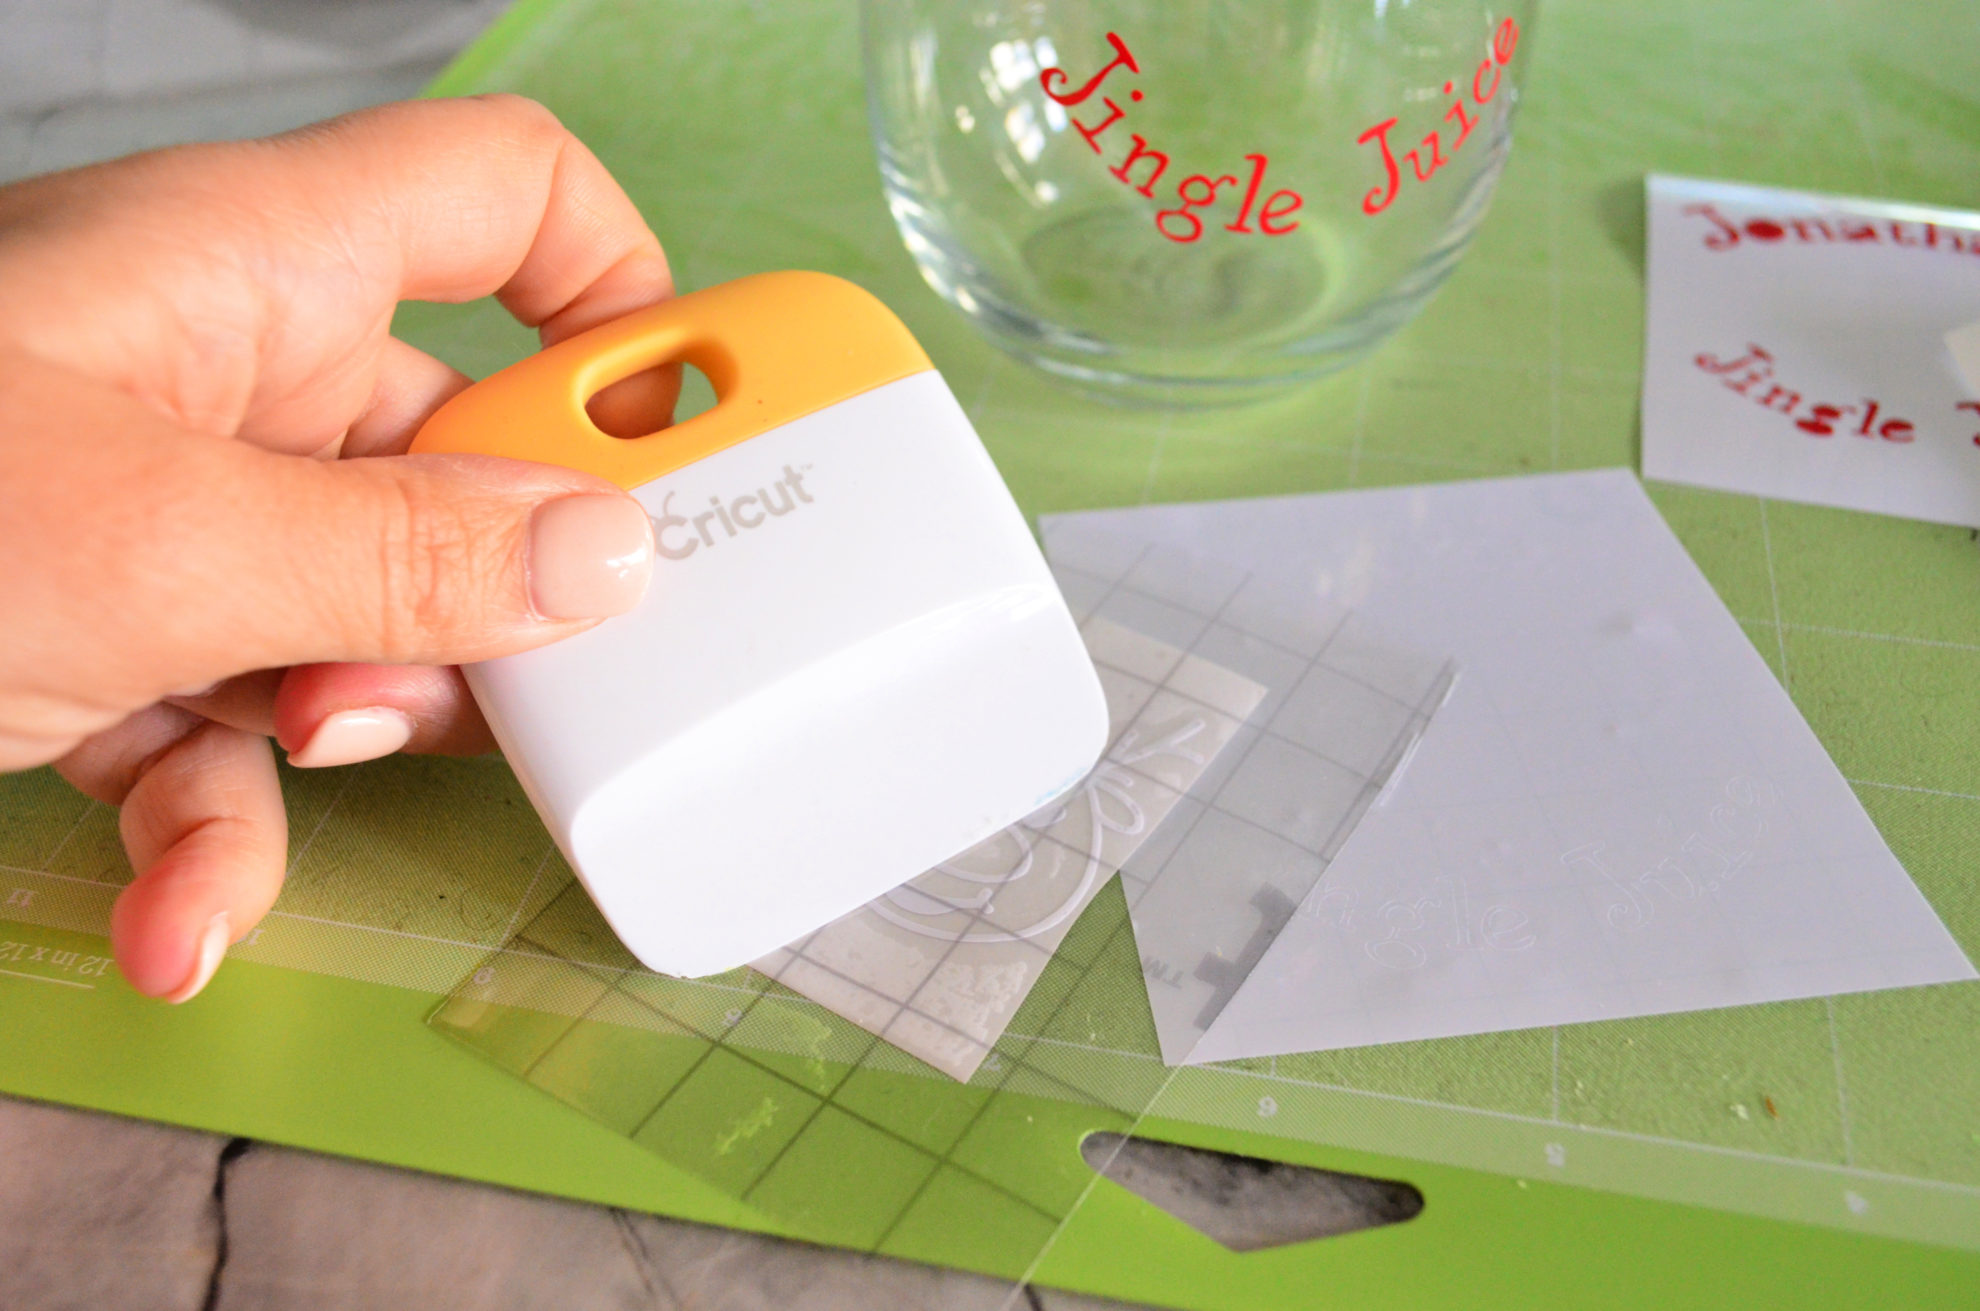 DIY Personalized Jingle Juice Wine Glasses Squeege Vinyl